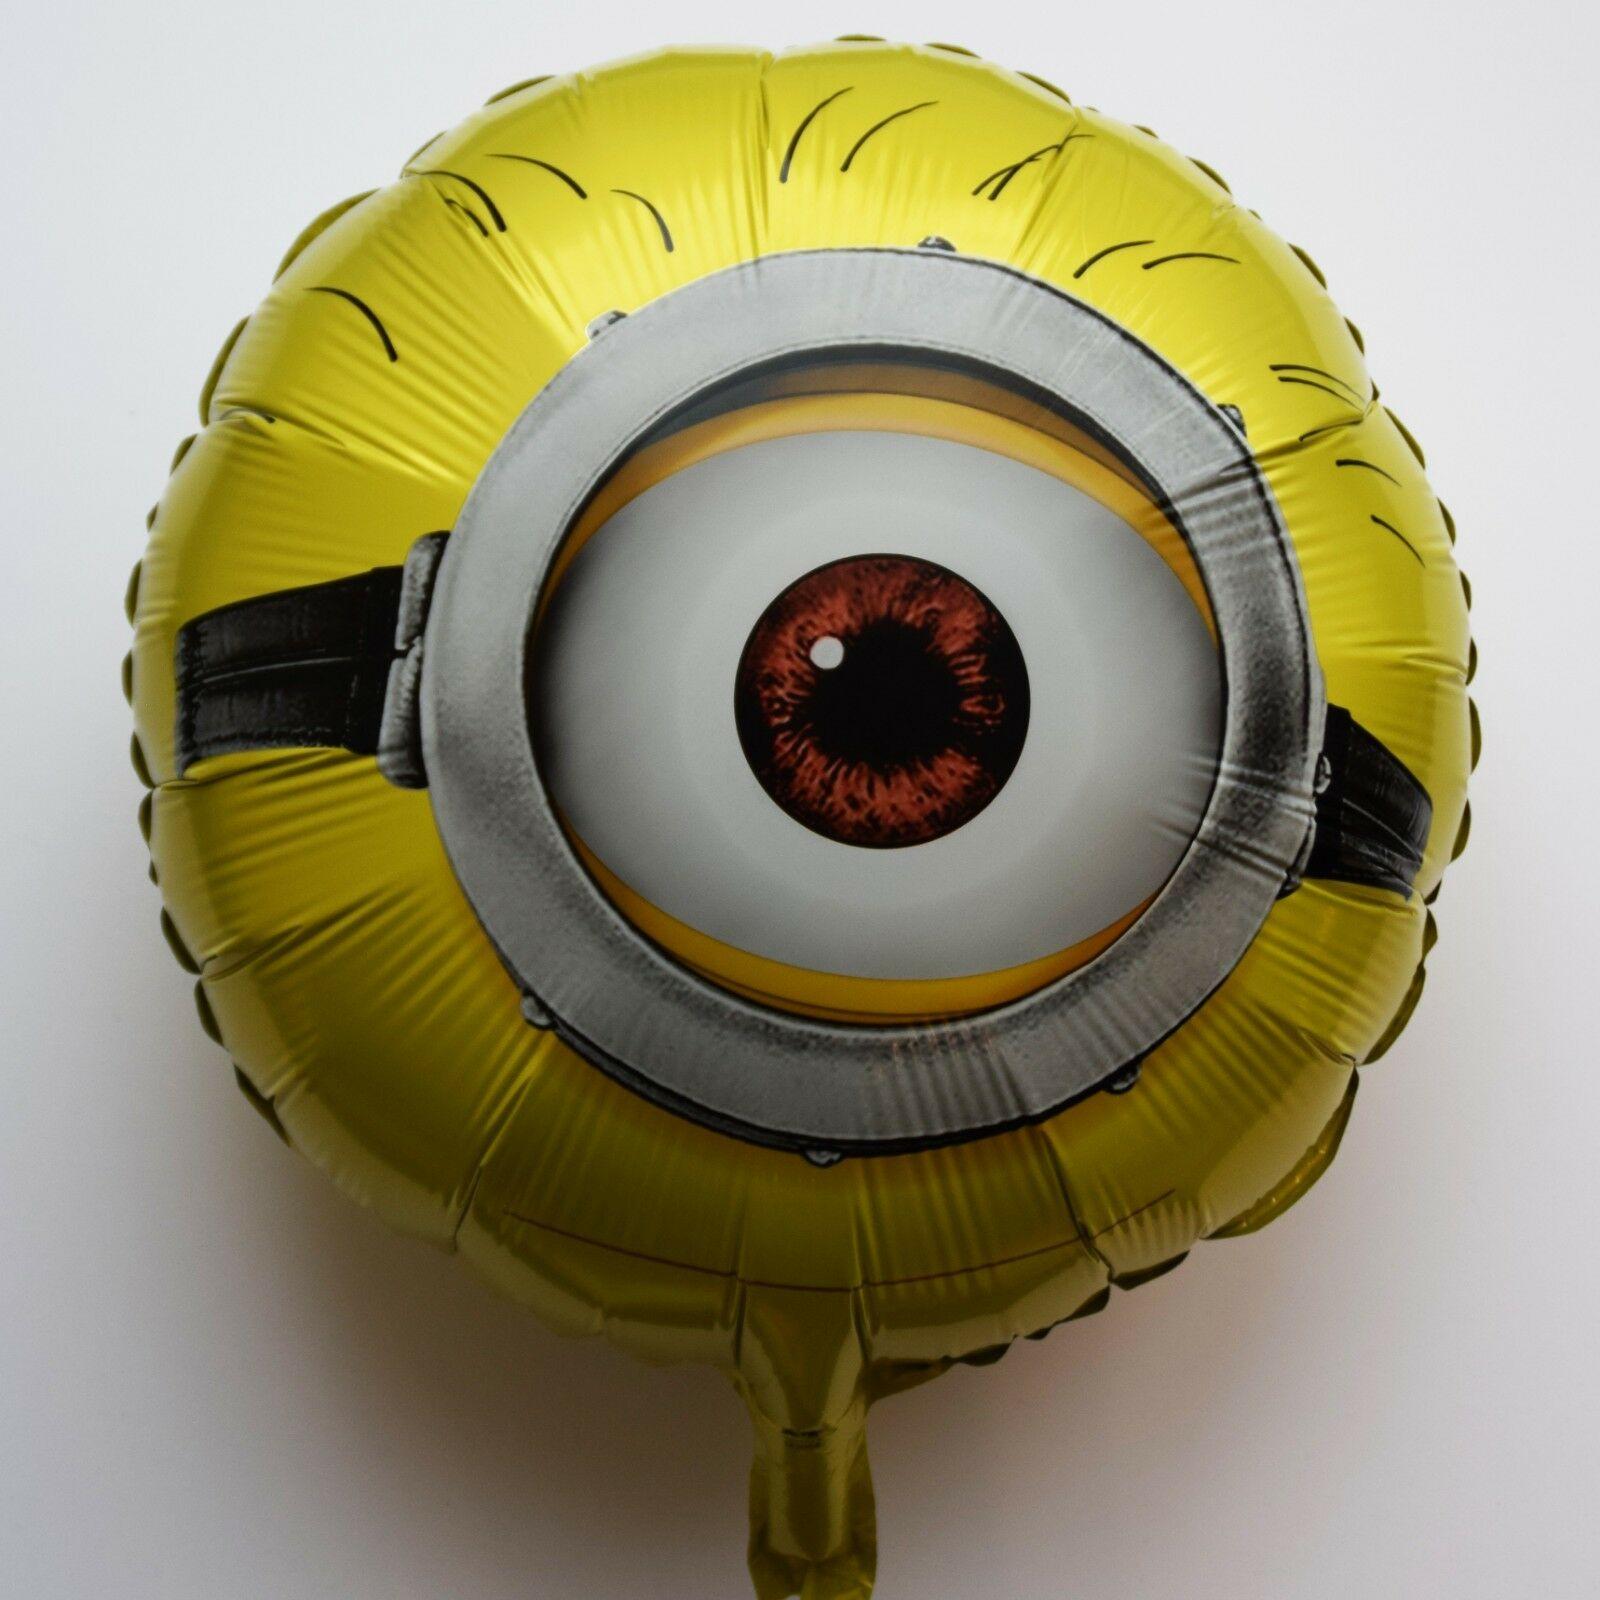 R20F1 XL Baby Einhorn Helium Folienballons Kinder Geburtstags Geschenk balloon